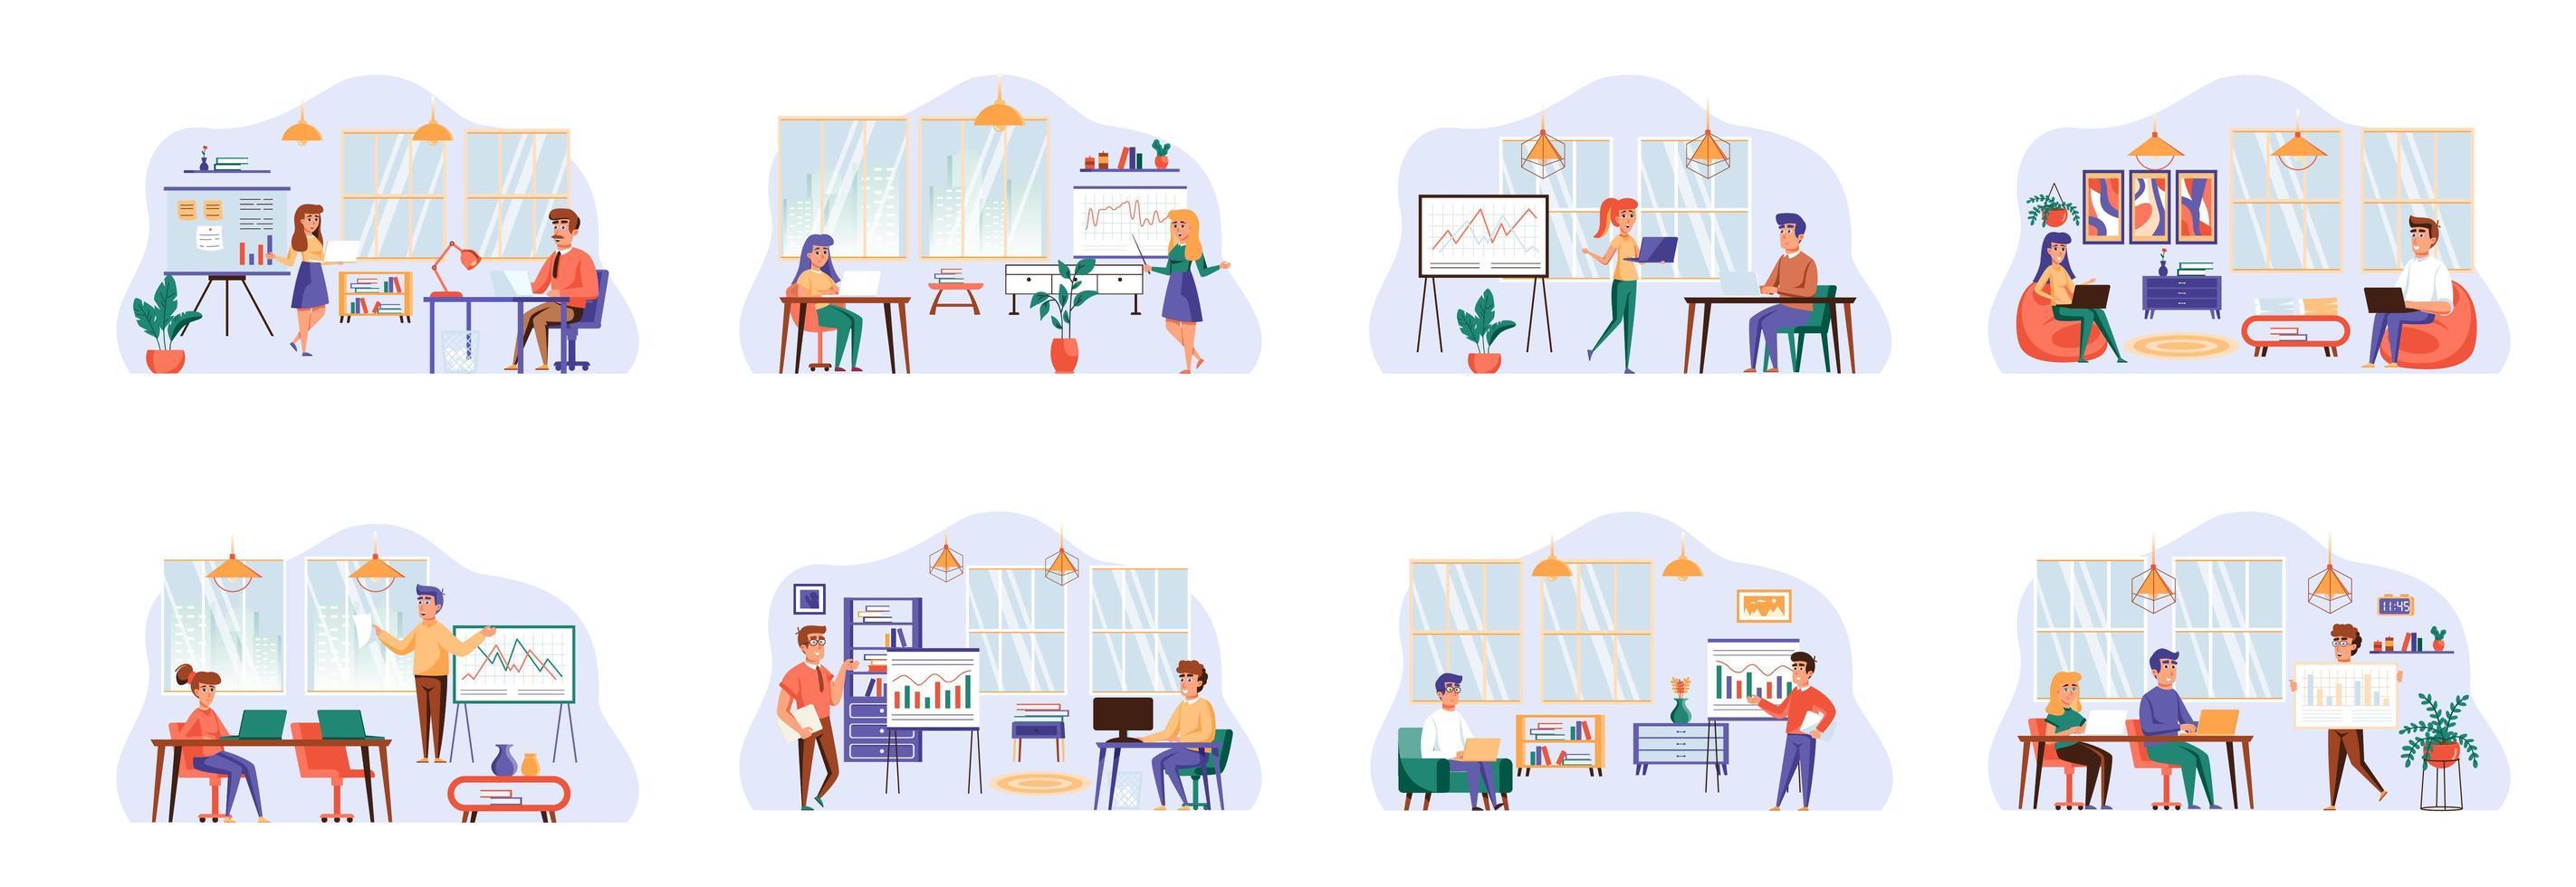 office manager bundel scènes met personagekarakters. vector